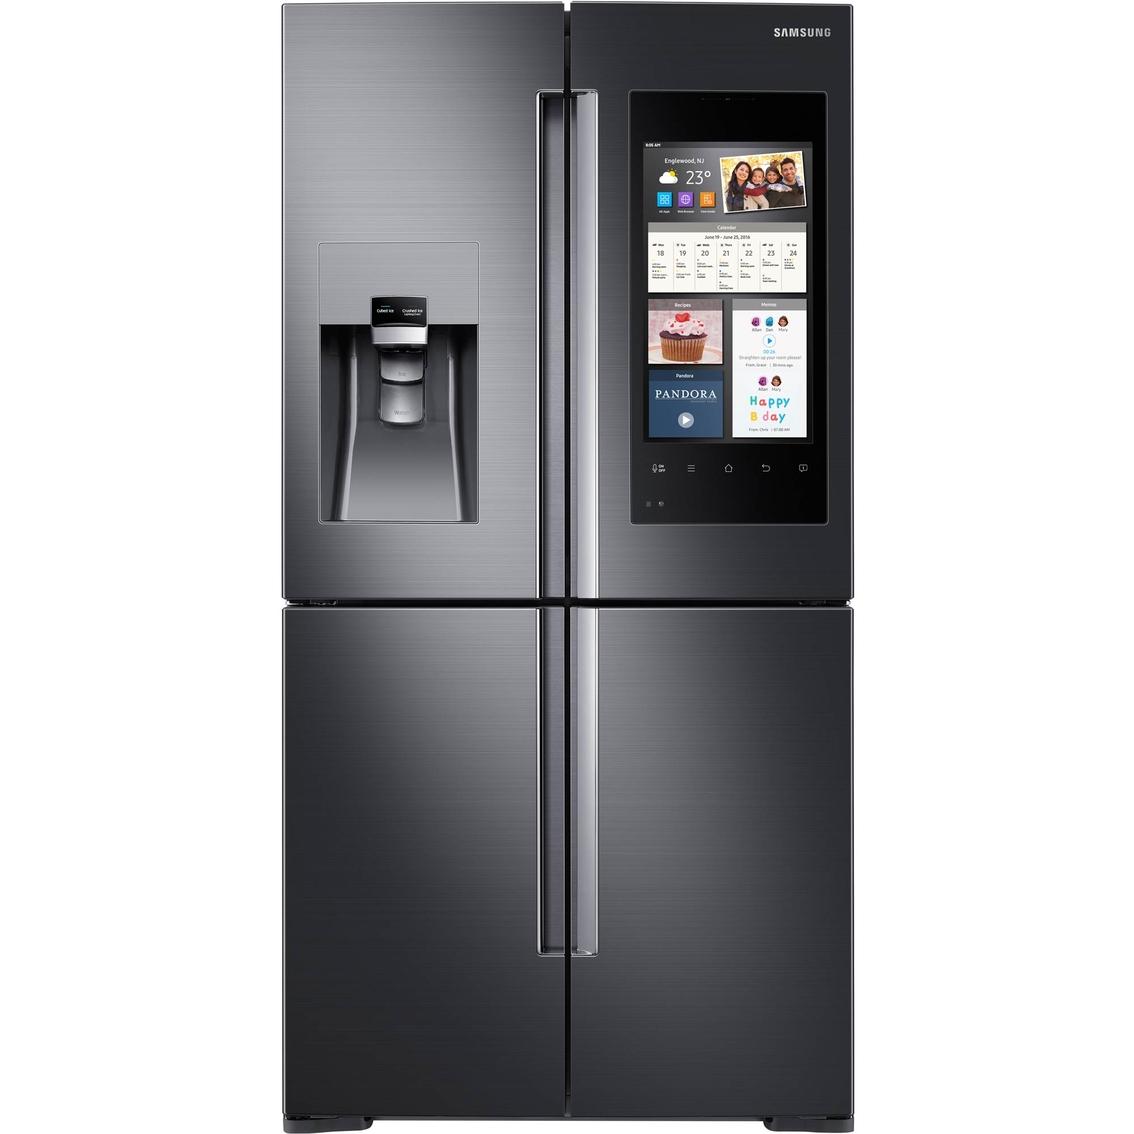 Samsung 28 Cu Ft  4 Door Flex Refrigerator With Family Hub 2 0